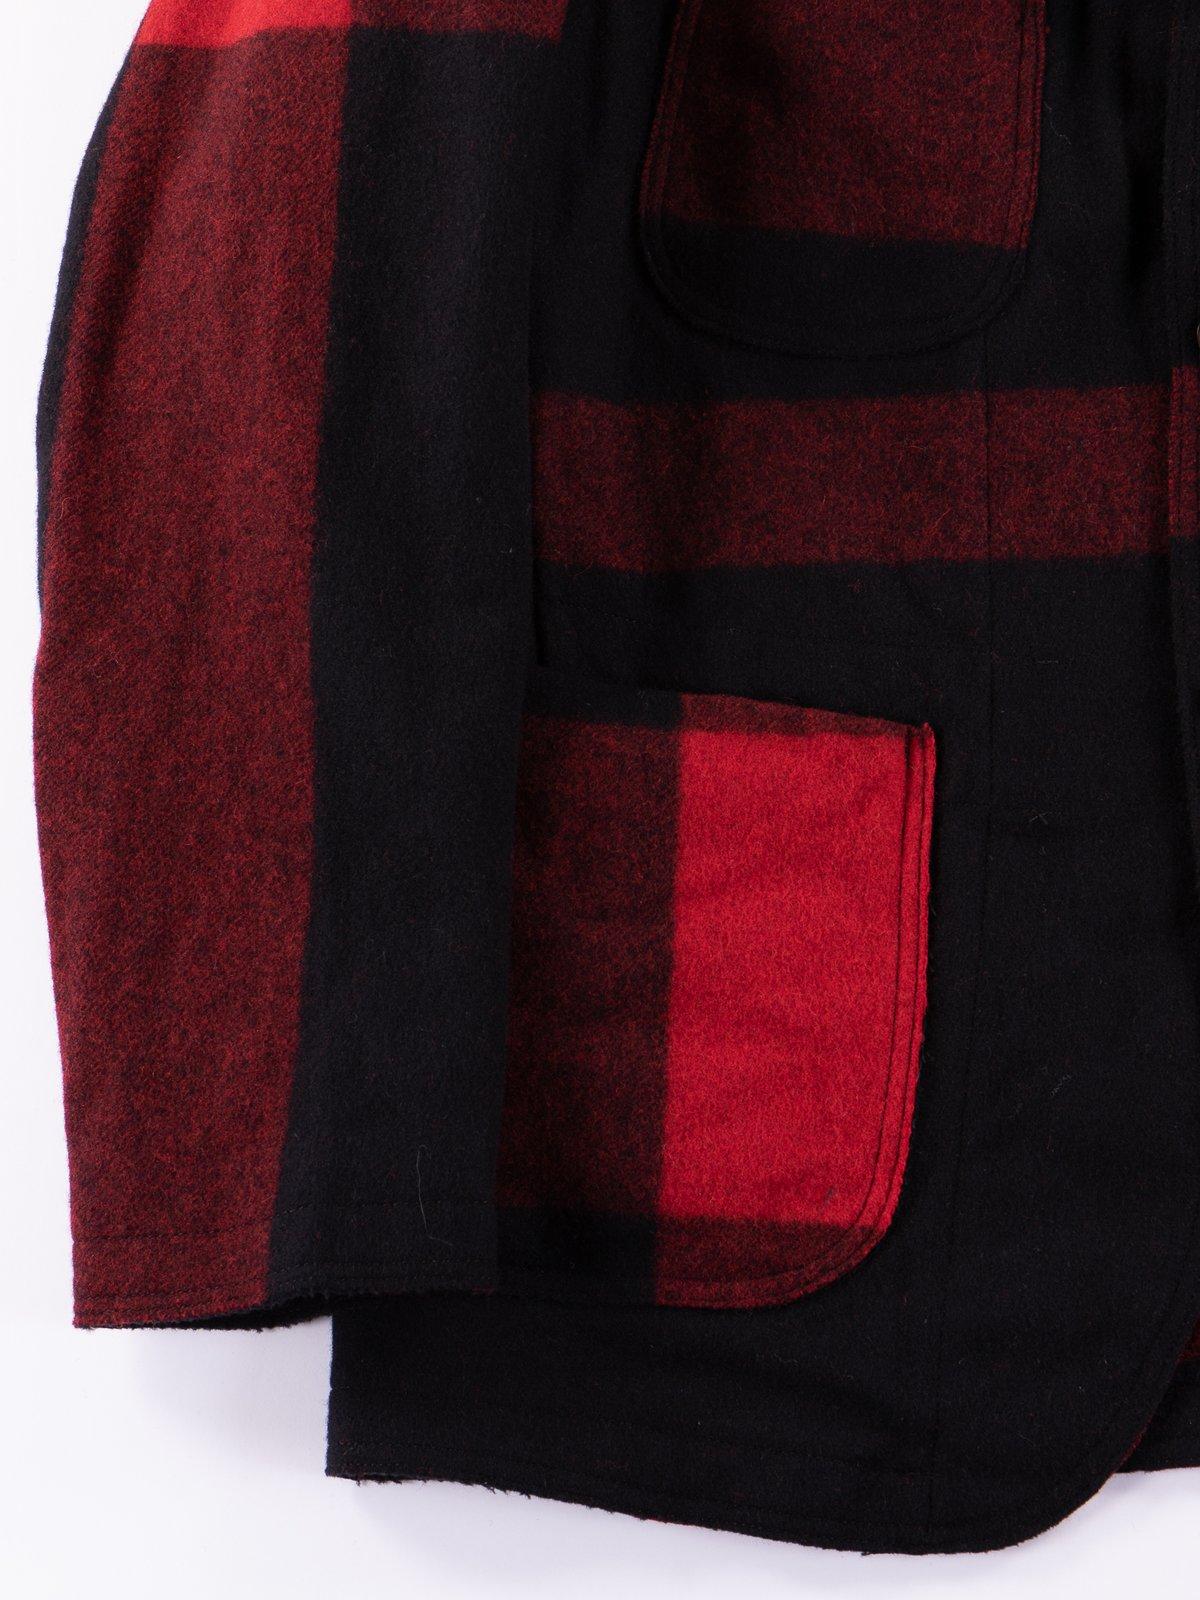 Black Big Plaid Wool Melton RE Bedford Jacket - Image 4